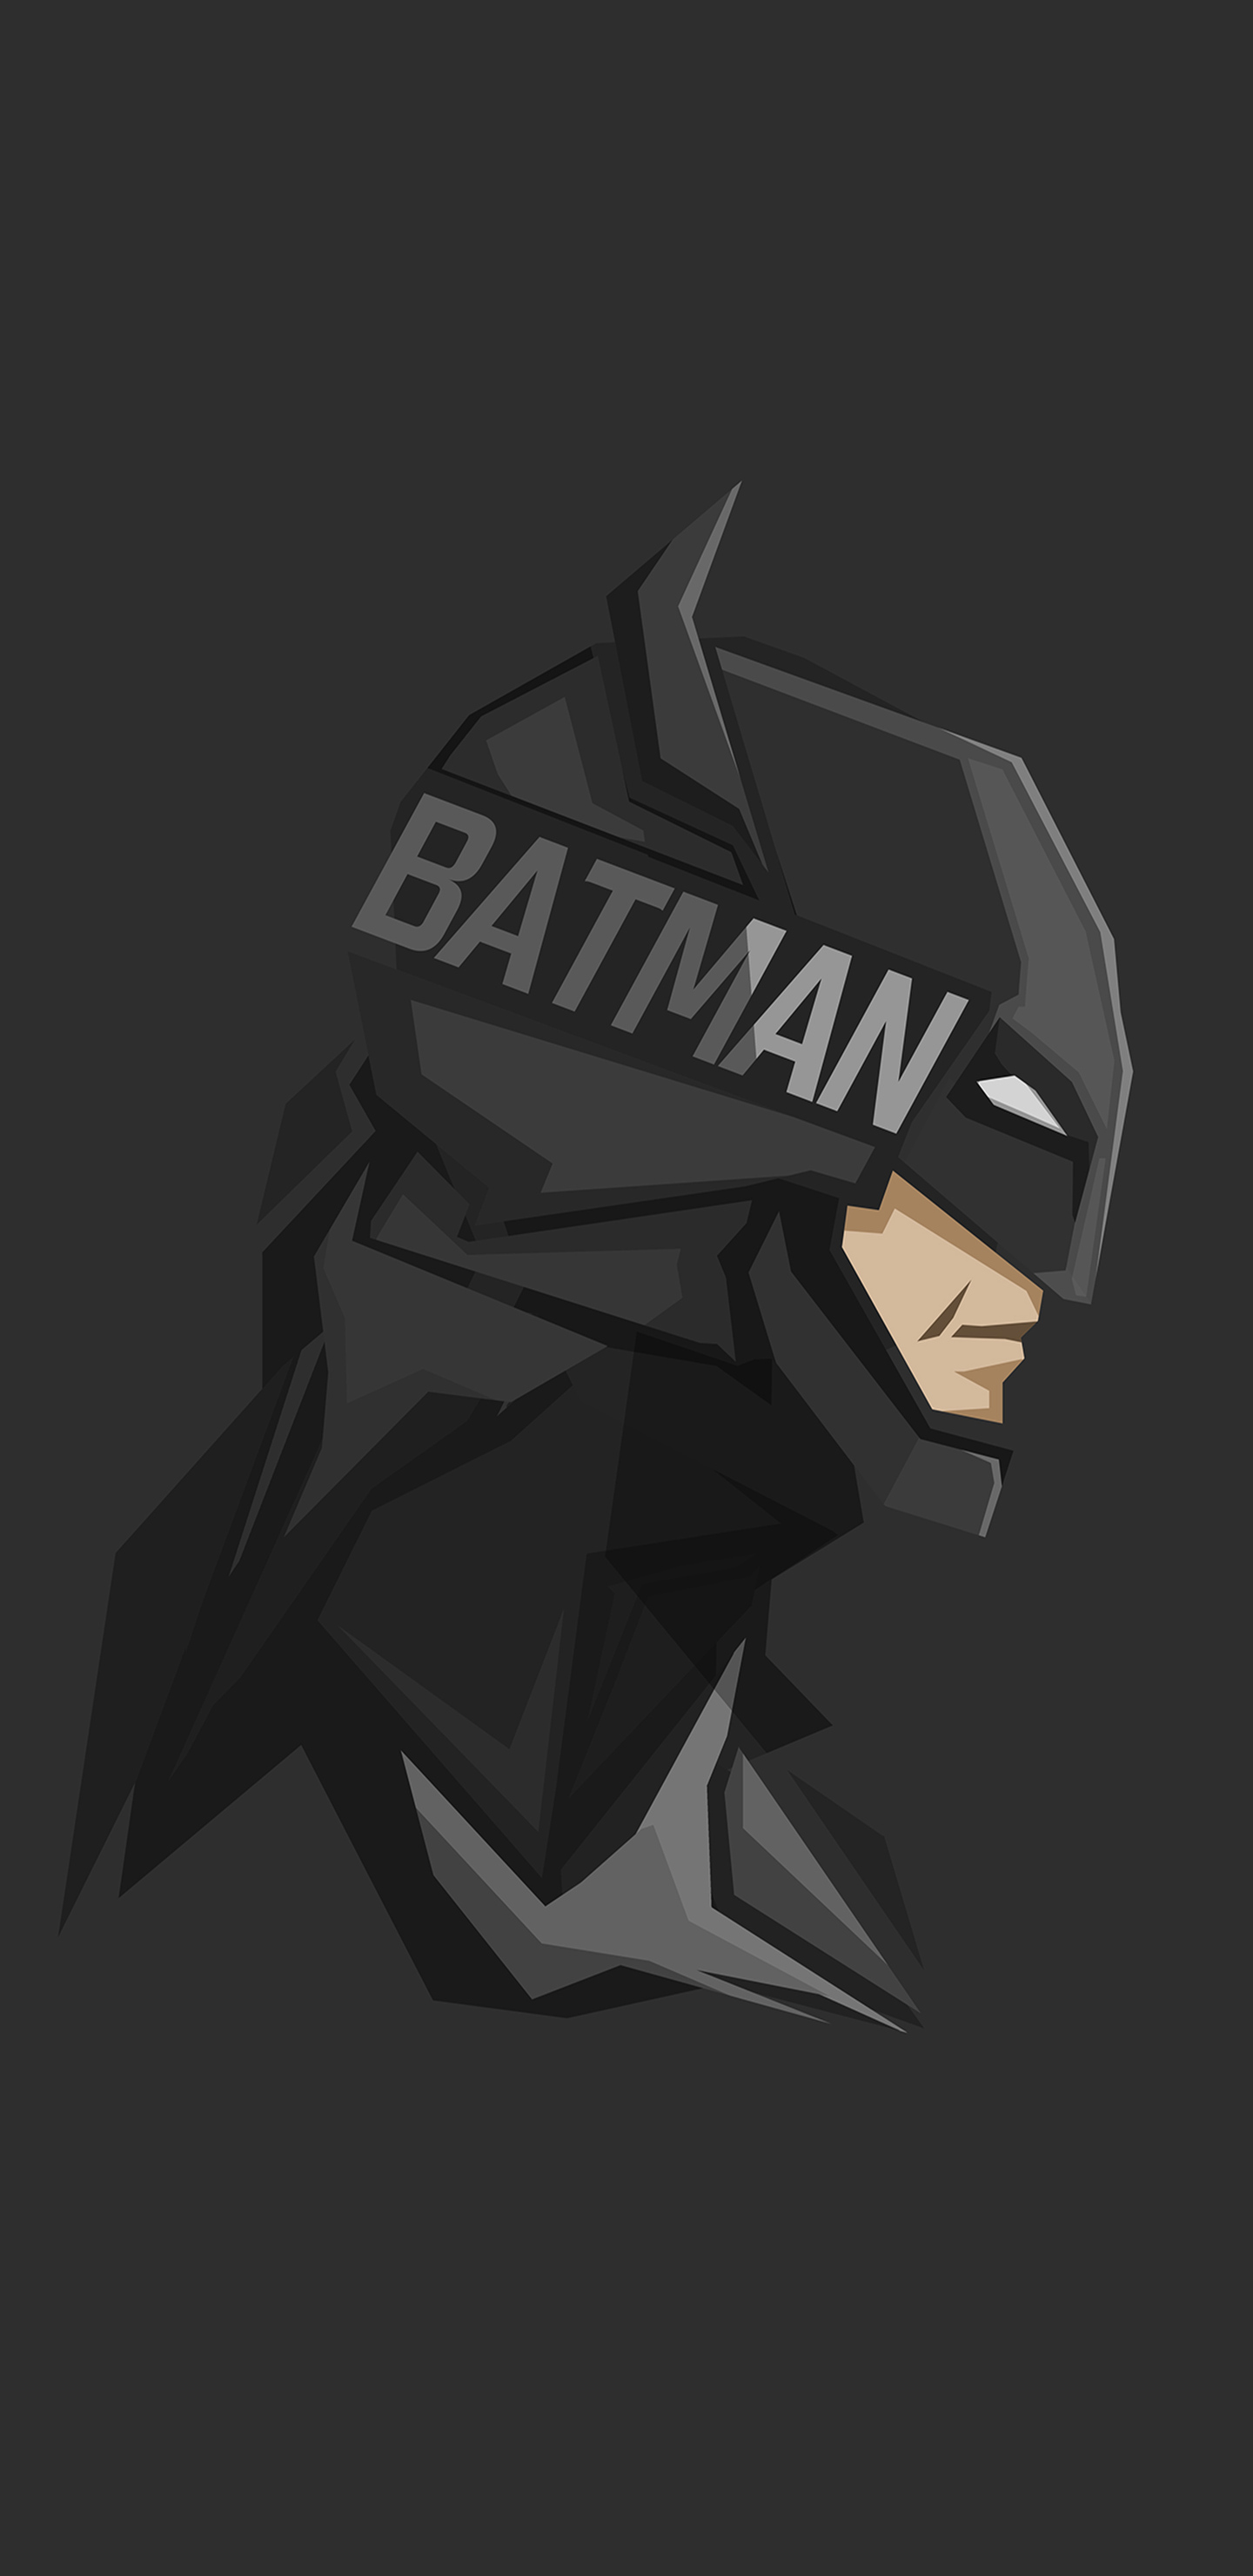 batman-minimal-facet-8k-z8.jpg